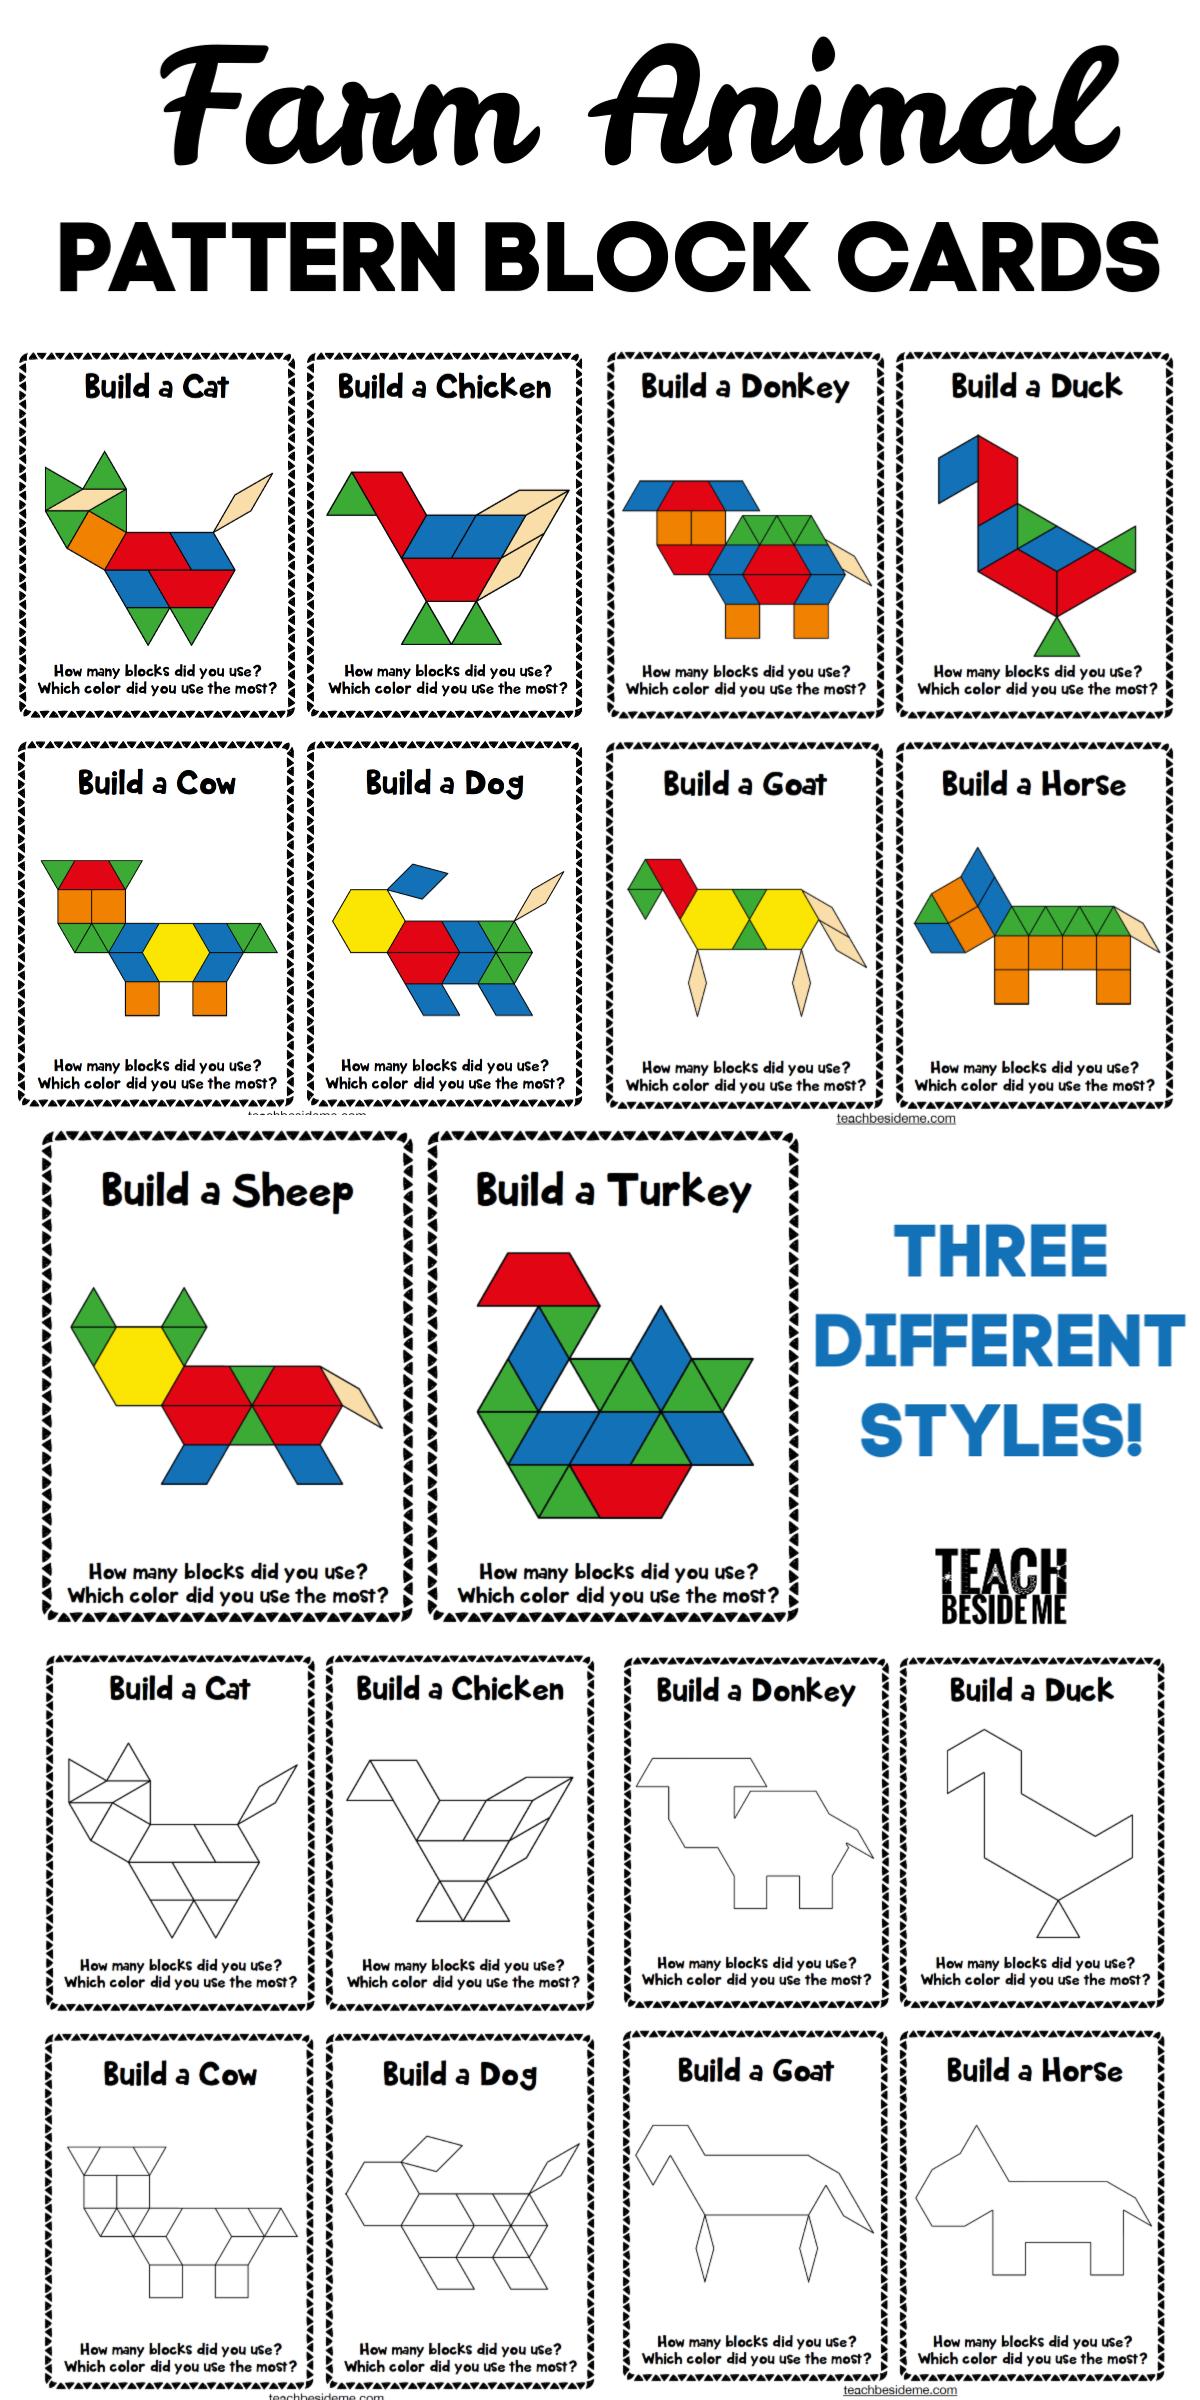 Farm Animal Pattern Block Cards Farm Animals Preschool Farm Math Activities Farm Preschool [ 2400 x 1200 Pixel ]